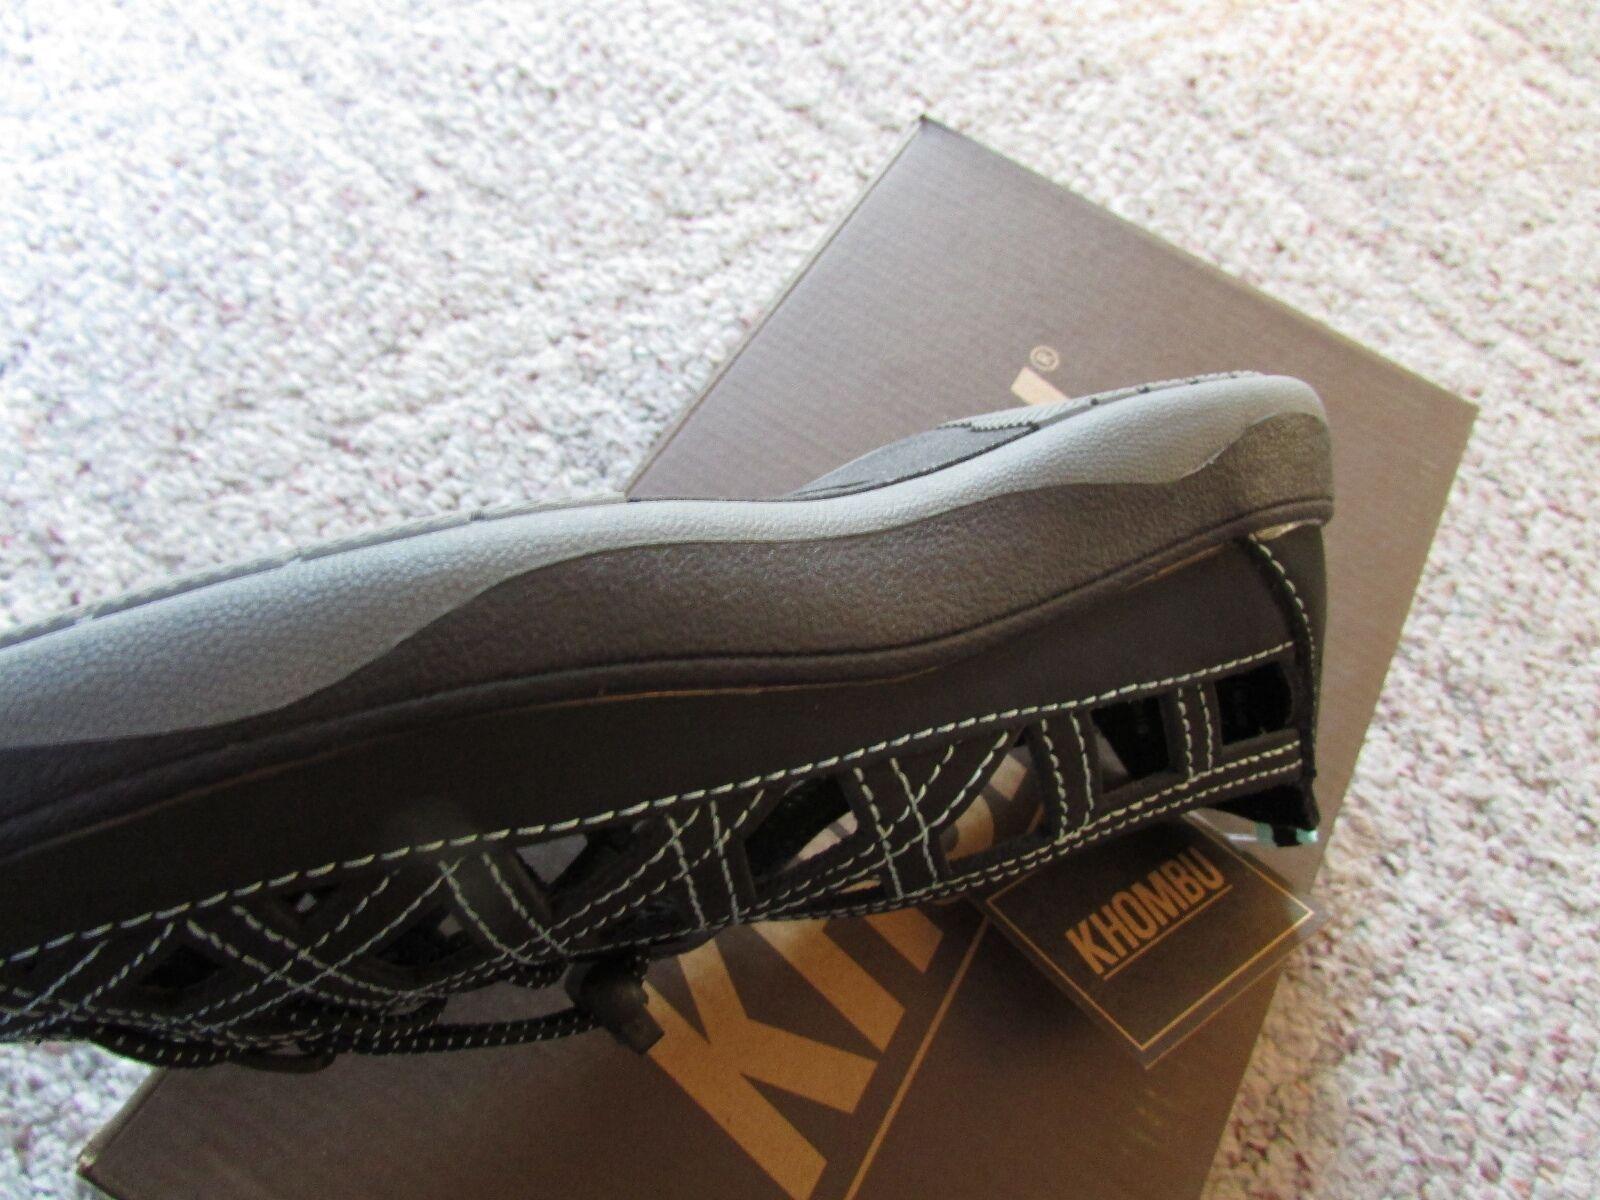 Louise et Cie Womens Shoes Flats AZALYA US 8.5 M 249 Black Leather Slip-on Bow 249 M 9e8a10